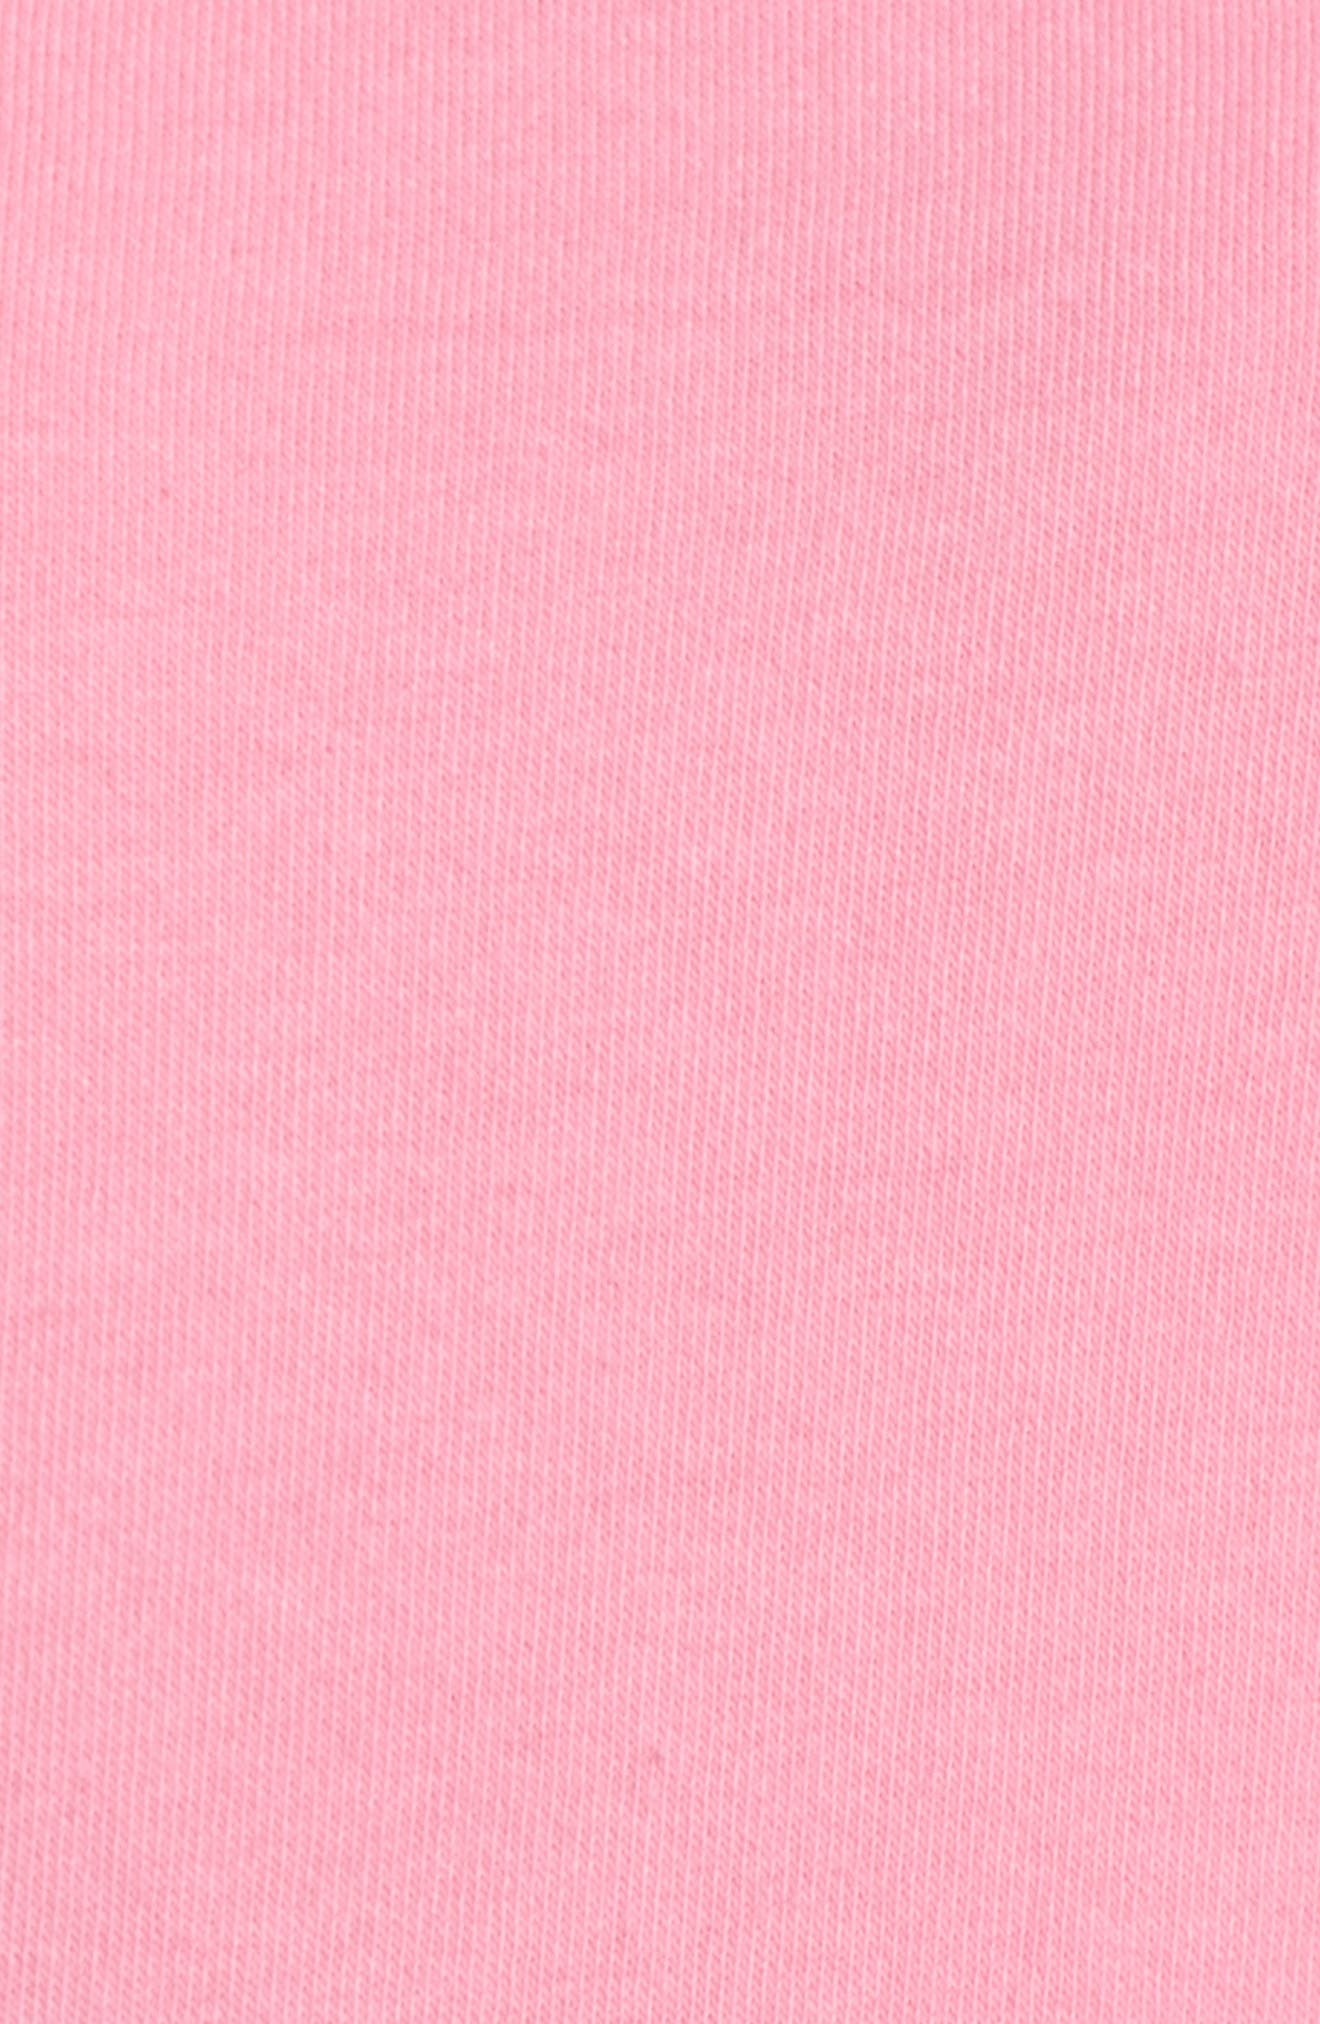 Sleepy Fleece Hoodie,                             Alternate thumbnail 6, color,                             Pink Sachet